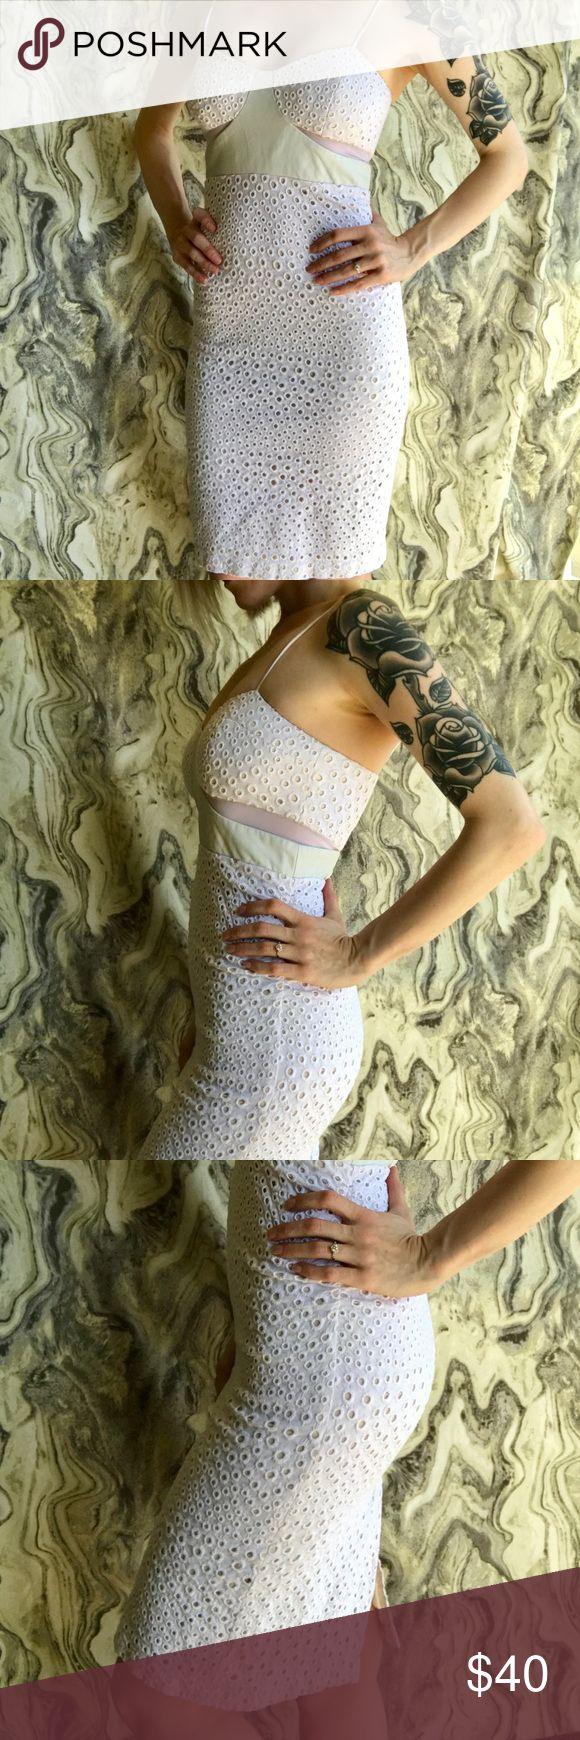 White Dress  NWOT The purrrrfect summer dress  zero flaws. Charlotte Ronson Dresses